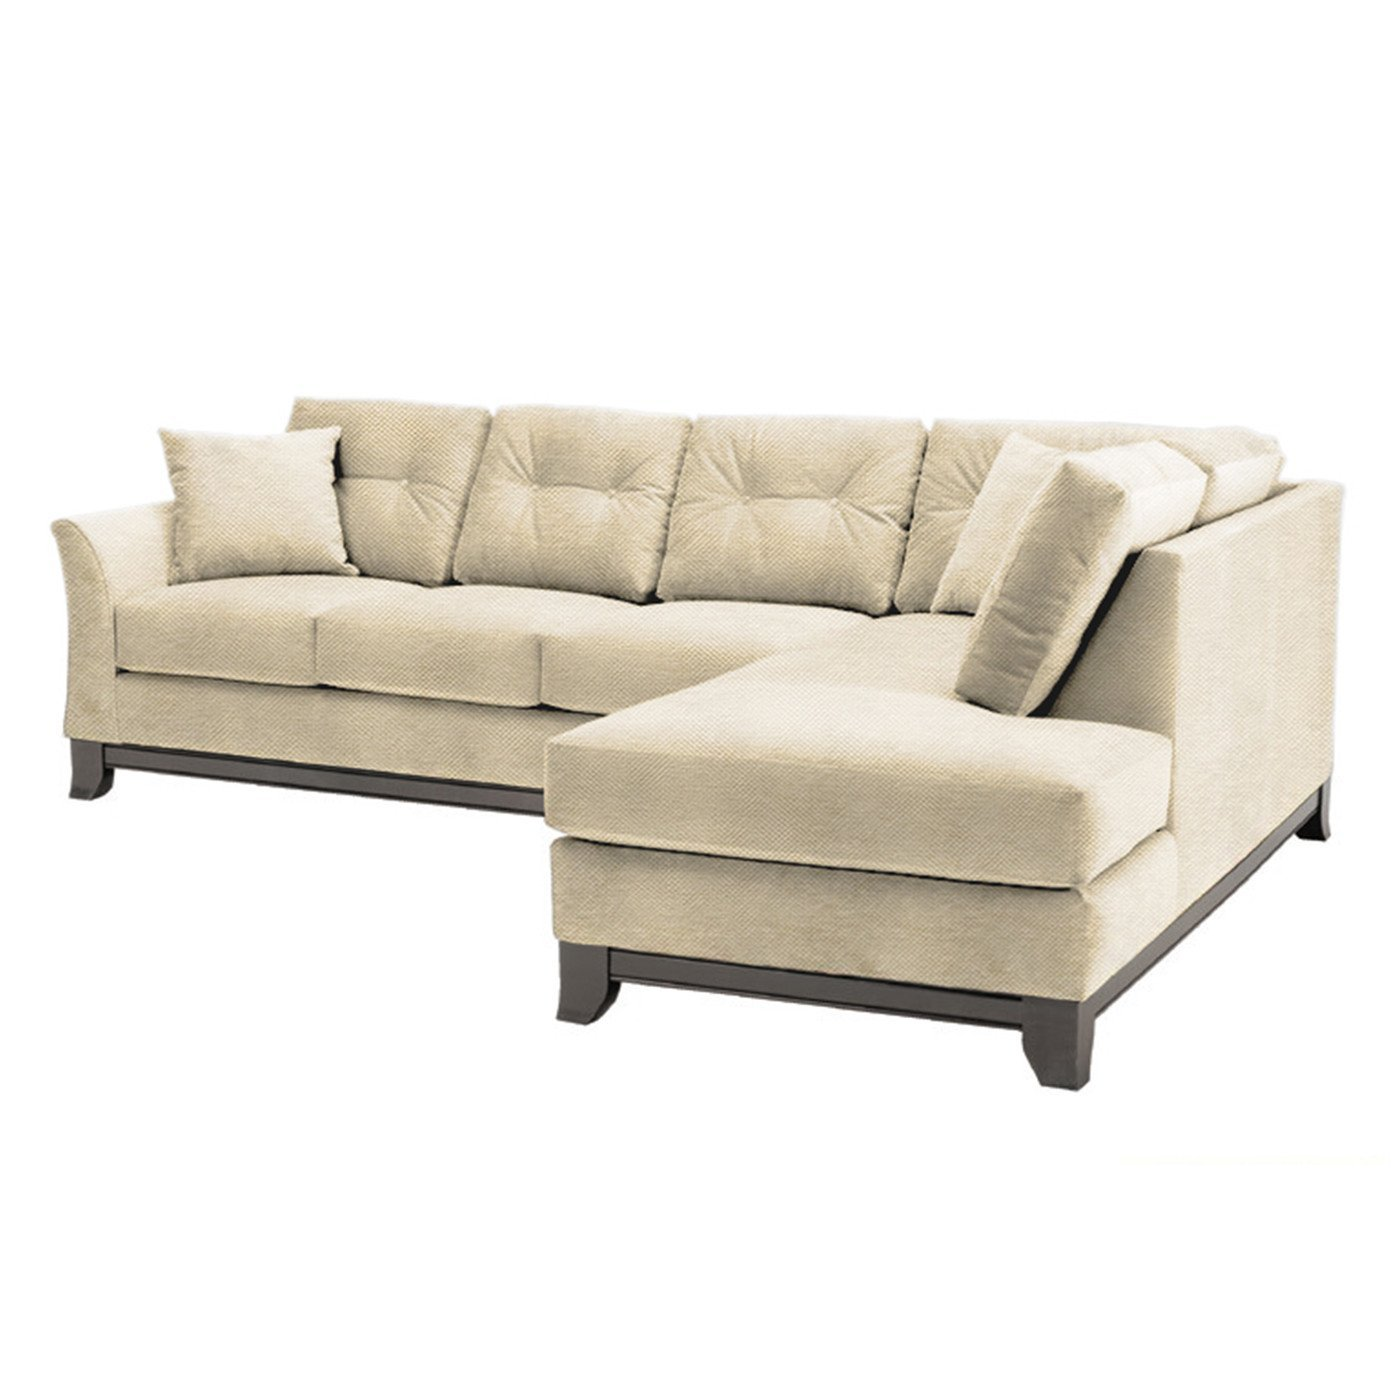 Sensational Amazon Com Marco 2 Piece Sectional Sofa Beige Raf Creativecarmelina Interior Chair Design Creativecarmelinacom